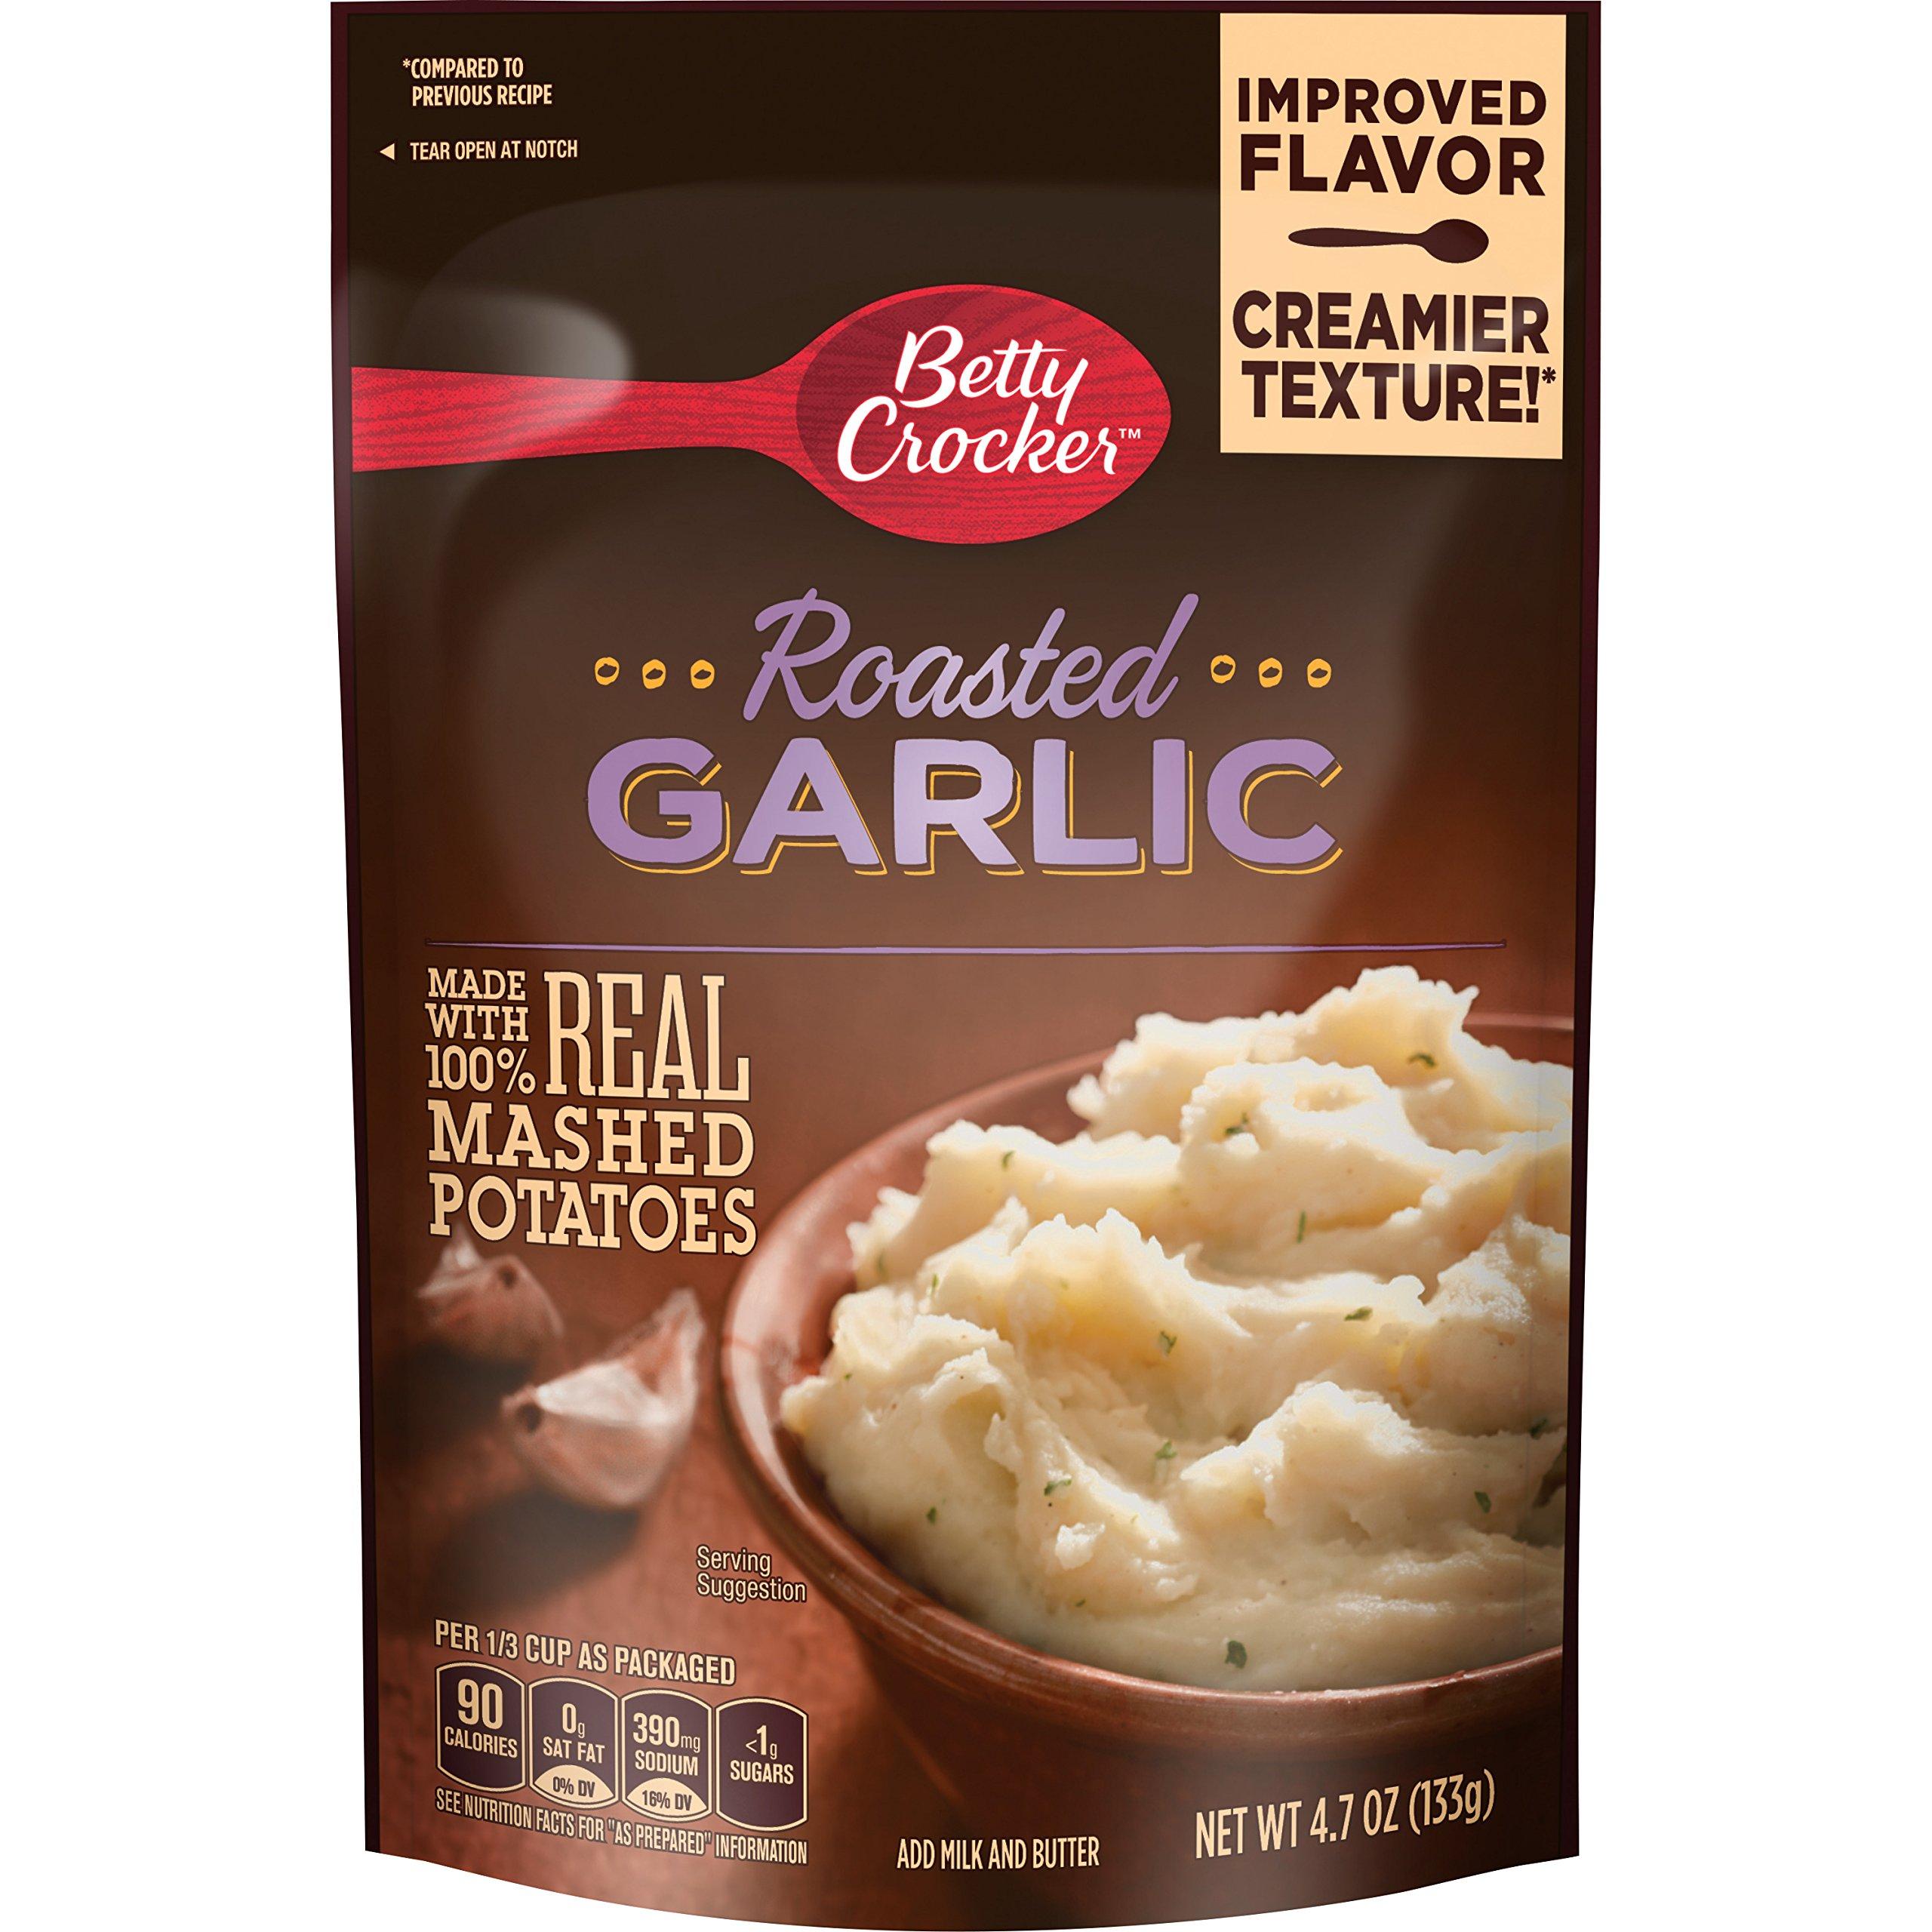 Betty Crocker Savory Roasted Garlic Potatoes, 4.7 Ounce